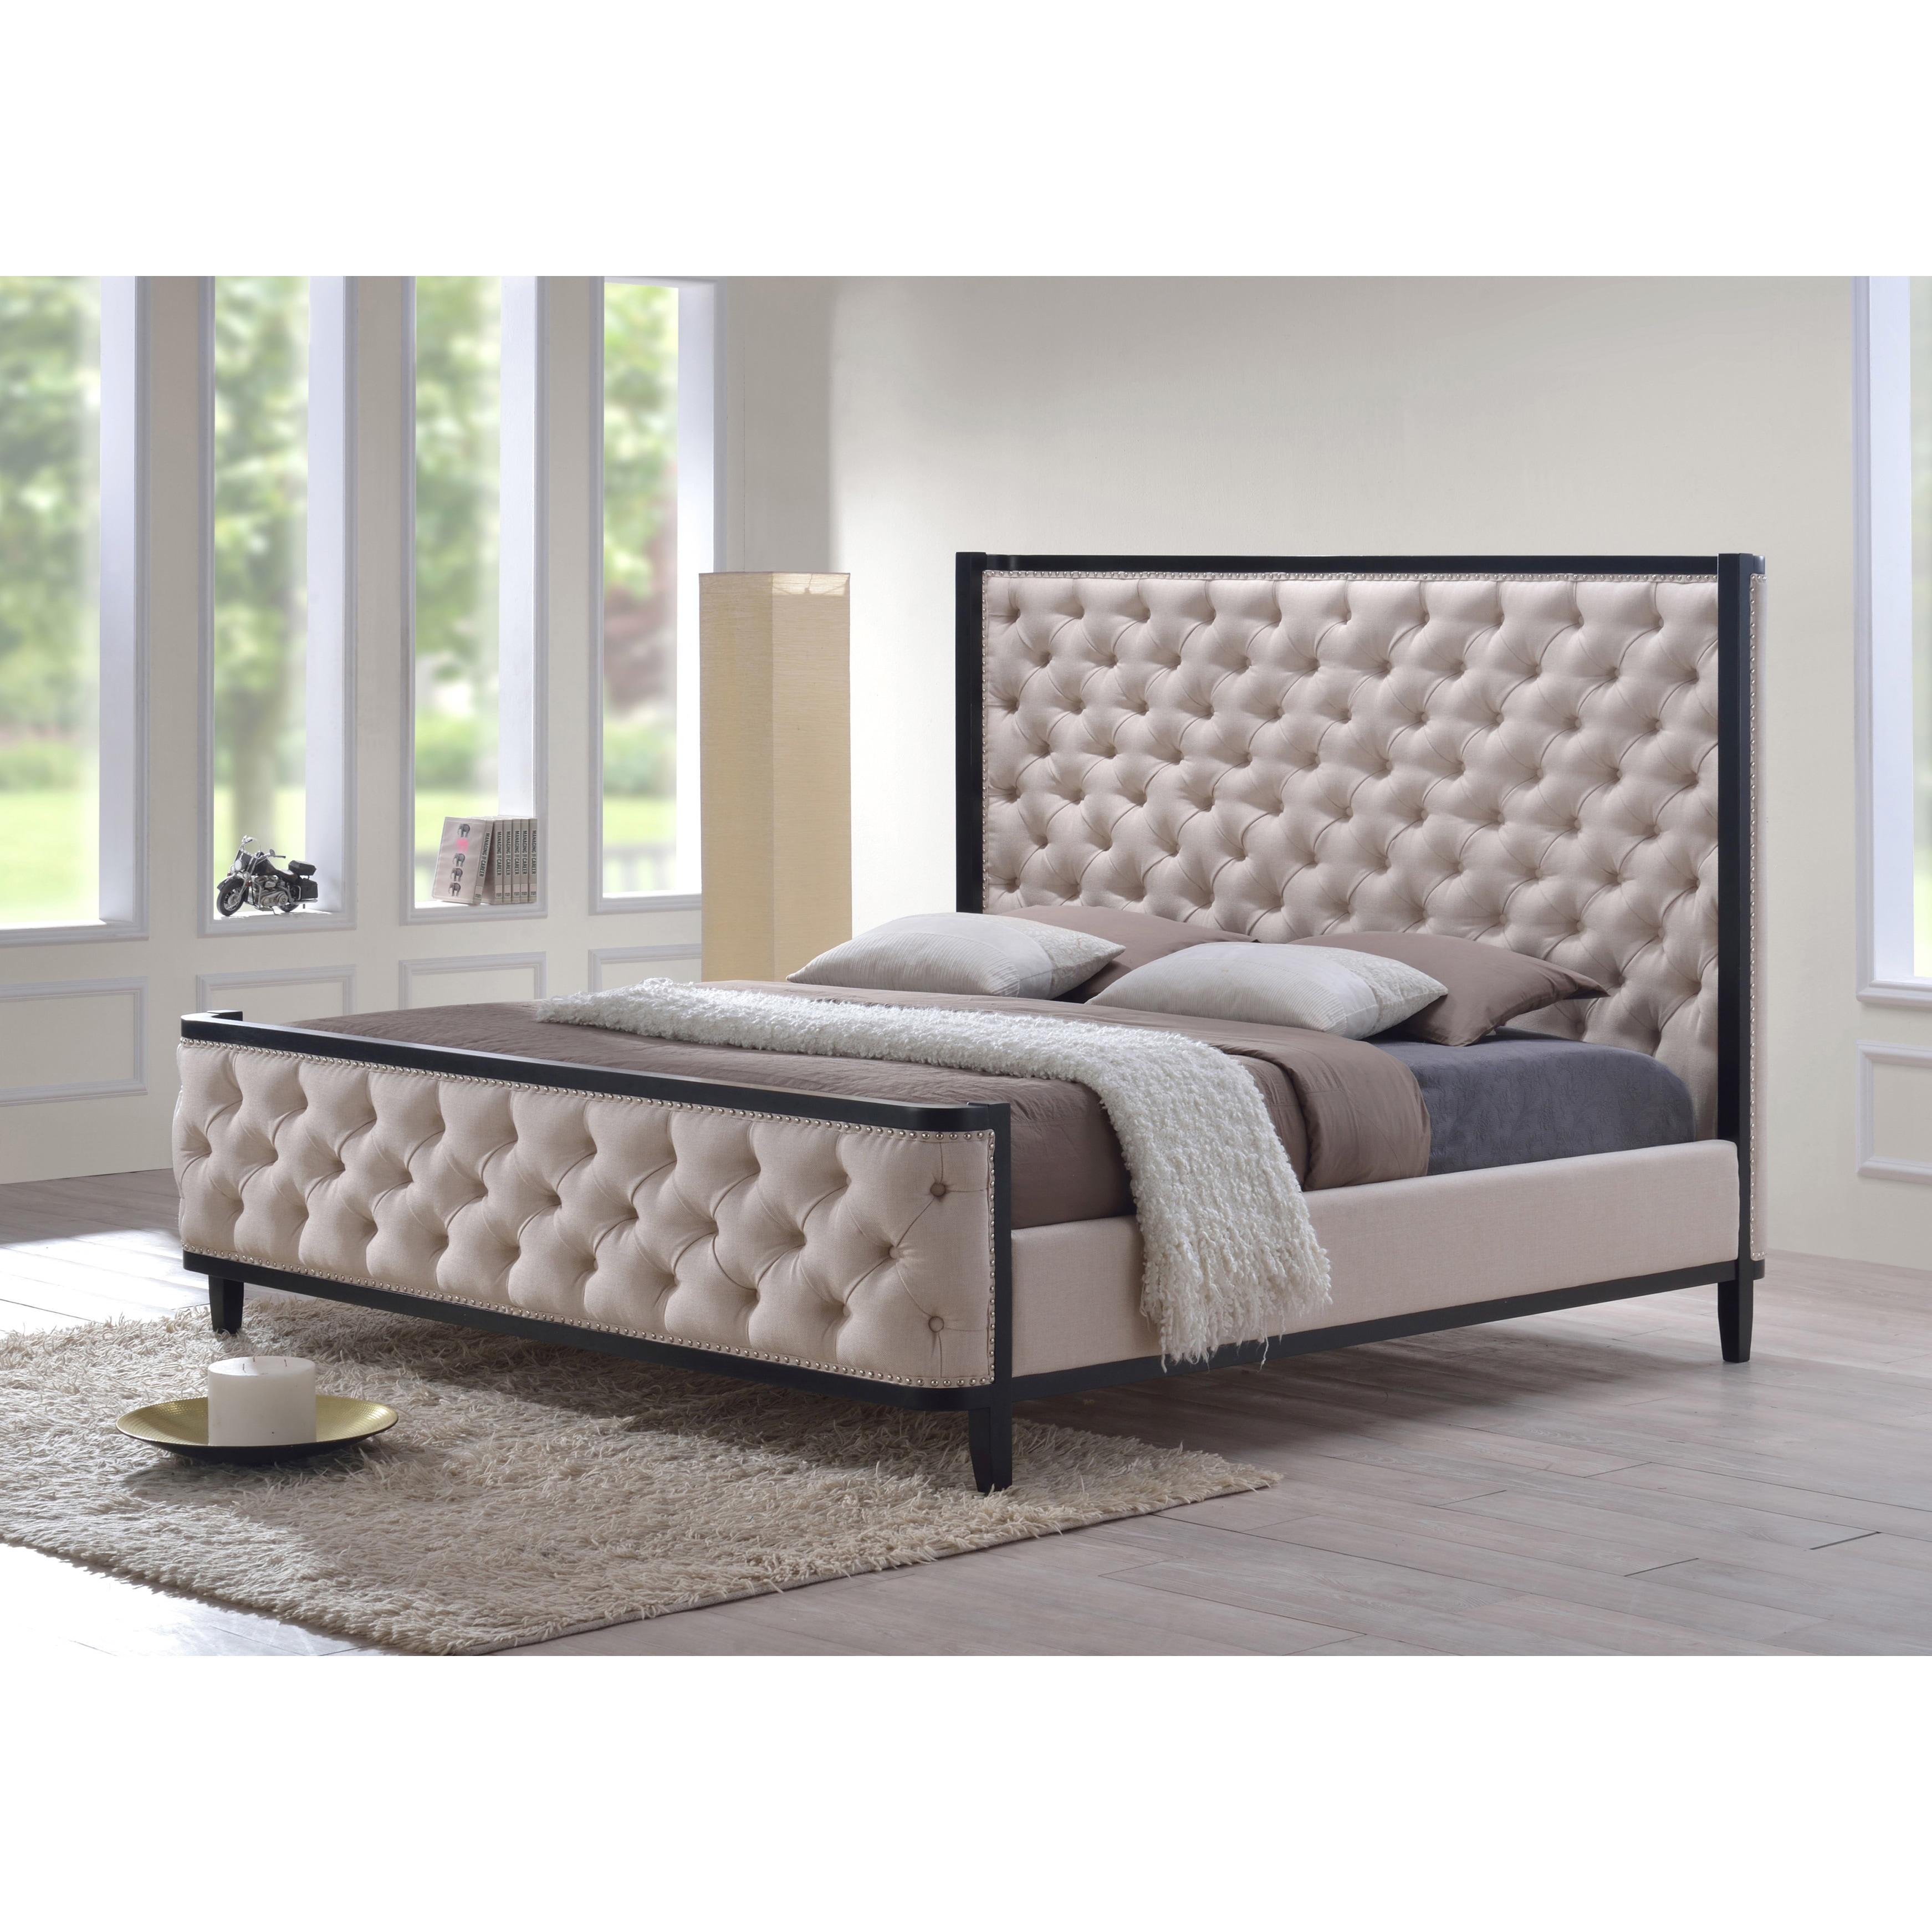 luxeo Kensington King Custard Fabric Tufted Upholstered B...